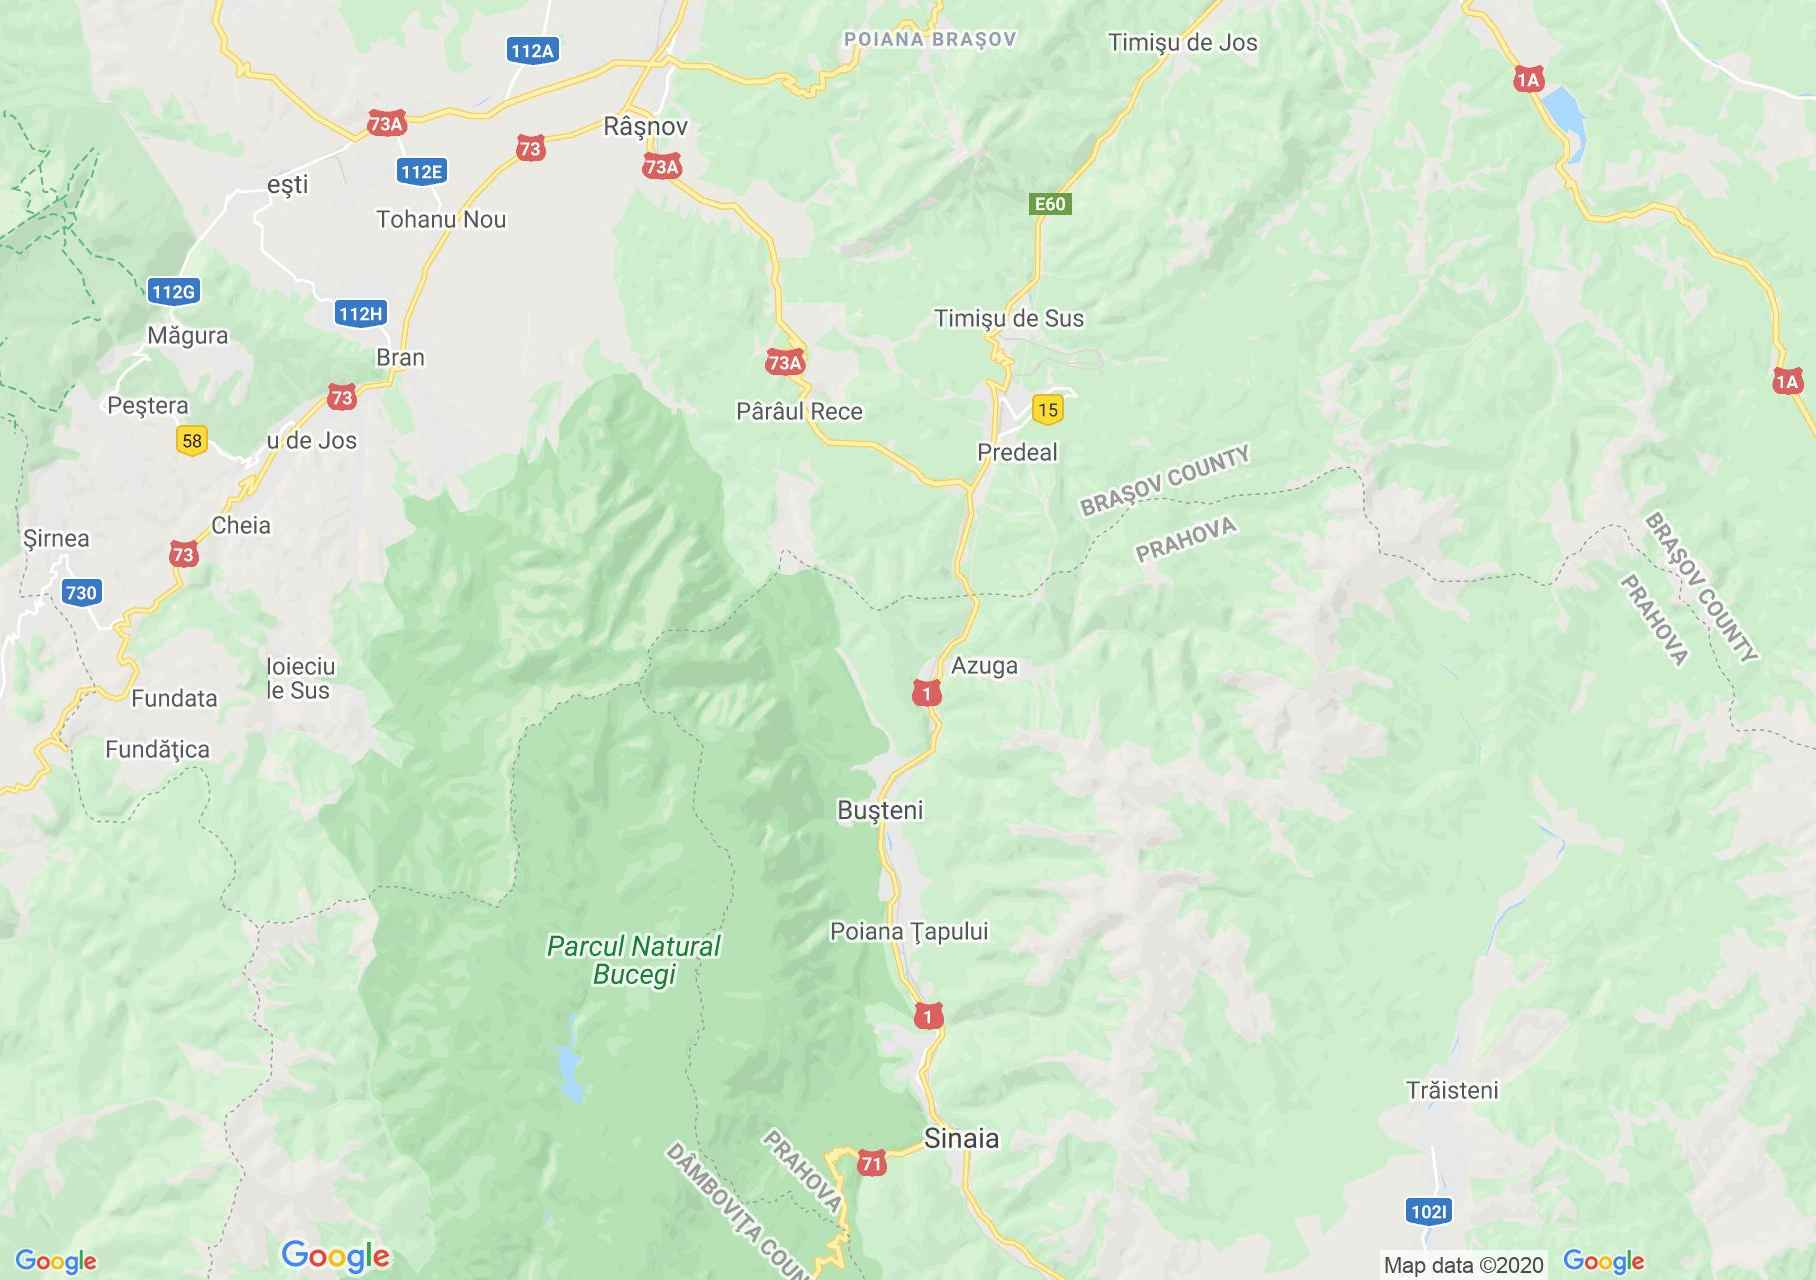 Predeál-Busteni interaktív turista térképe.